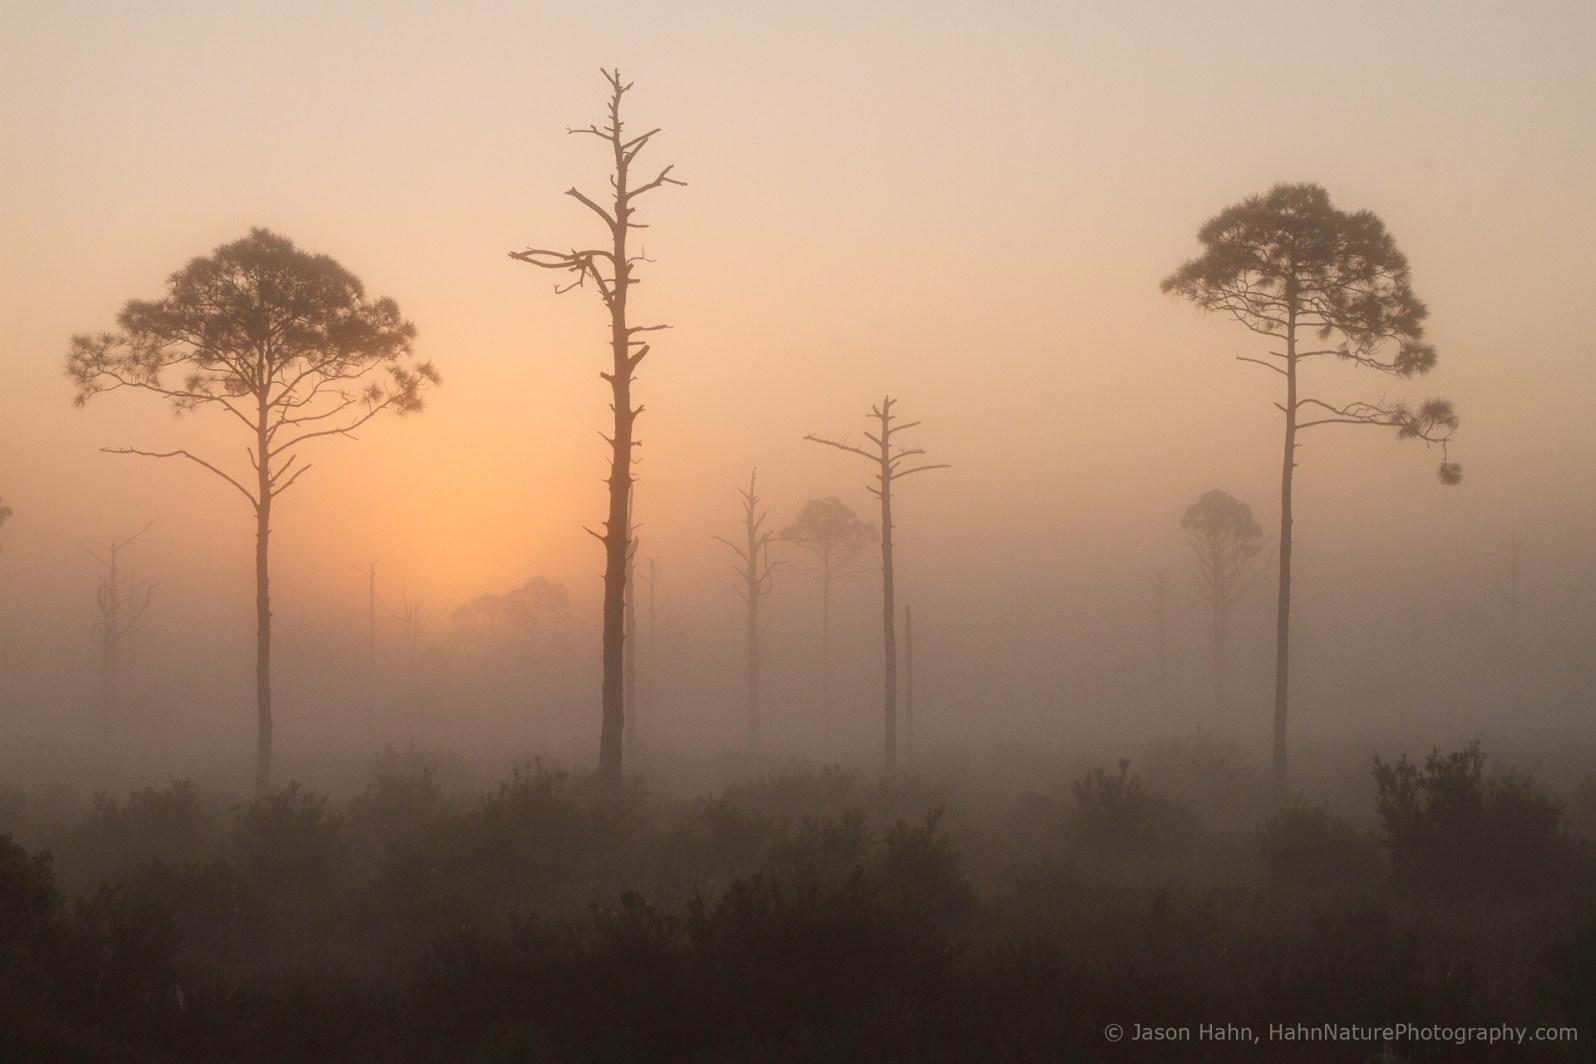 Ground fog at sunrise, softening the scene